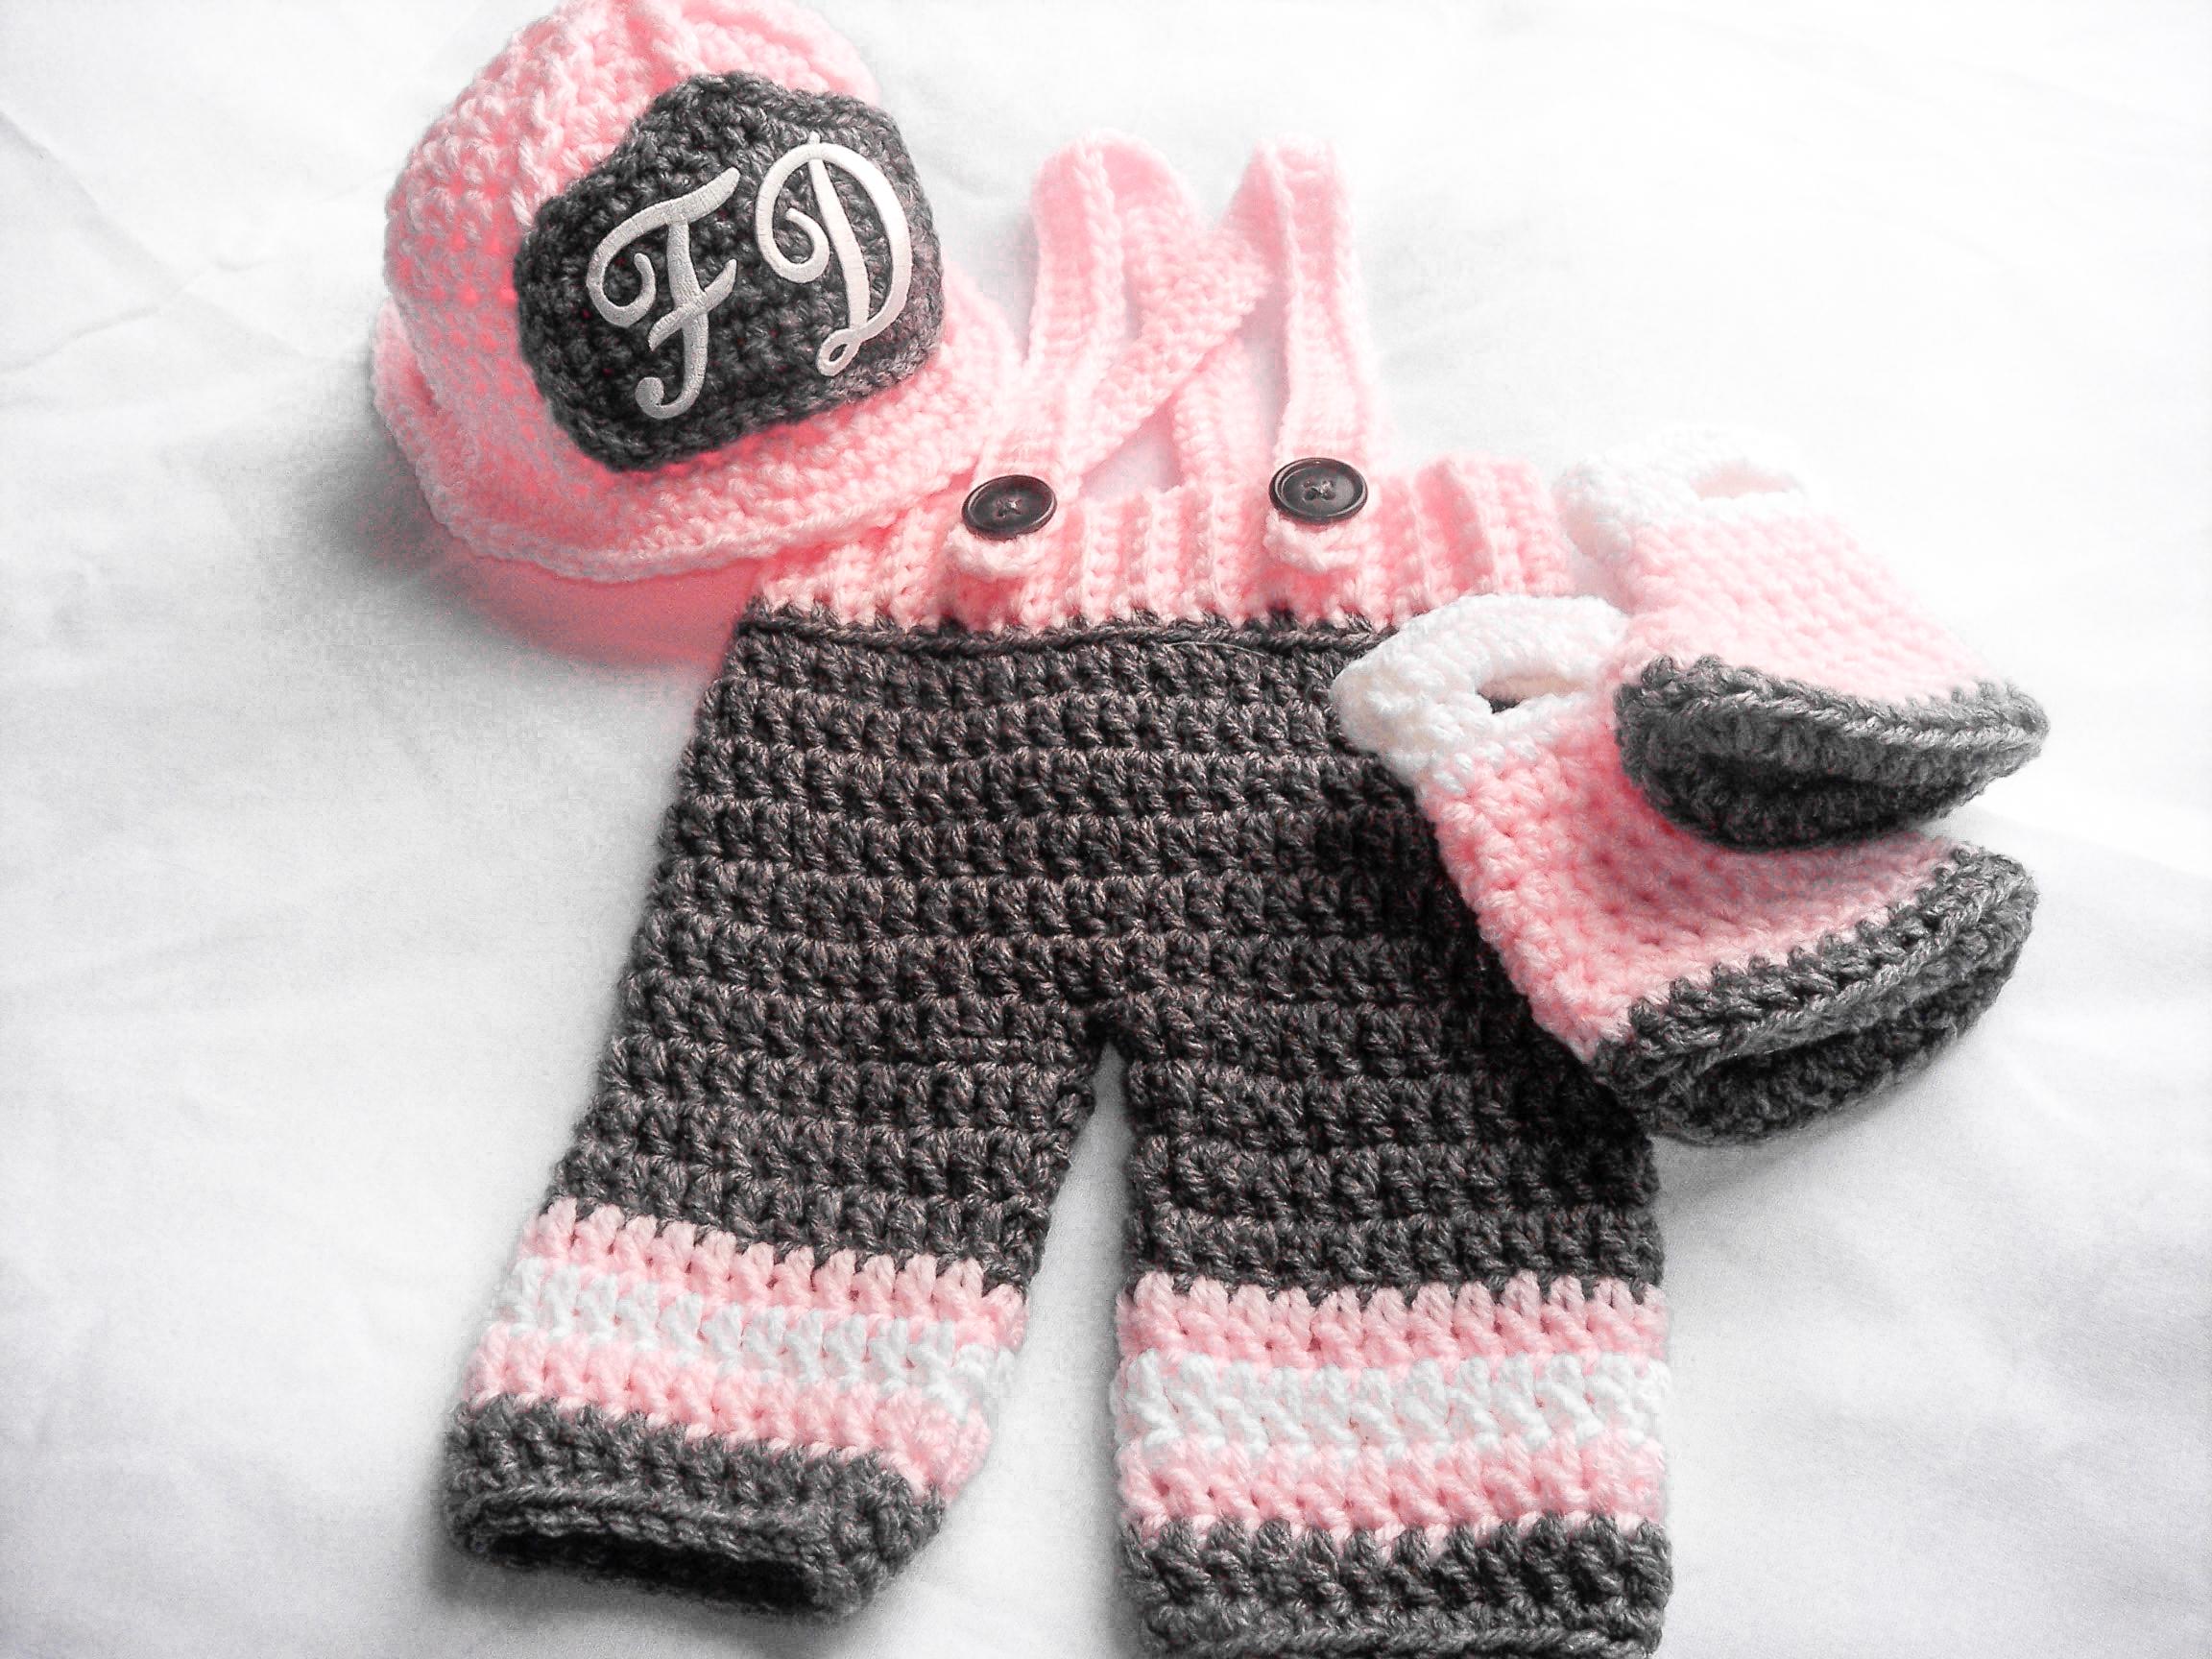 Baby Girl Firefighter Fireman Outfit Crochet Halloween Costume